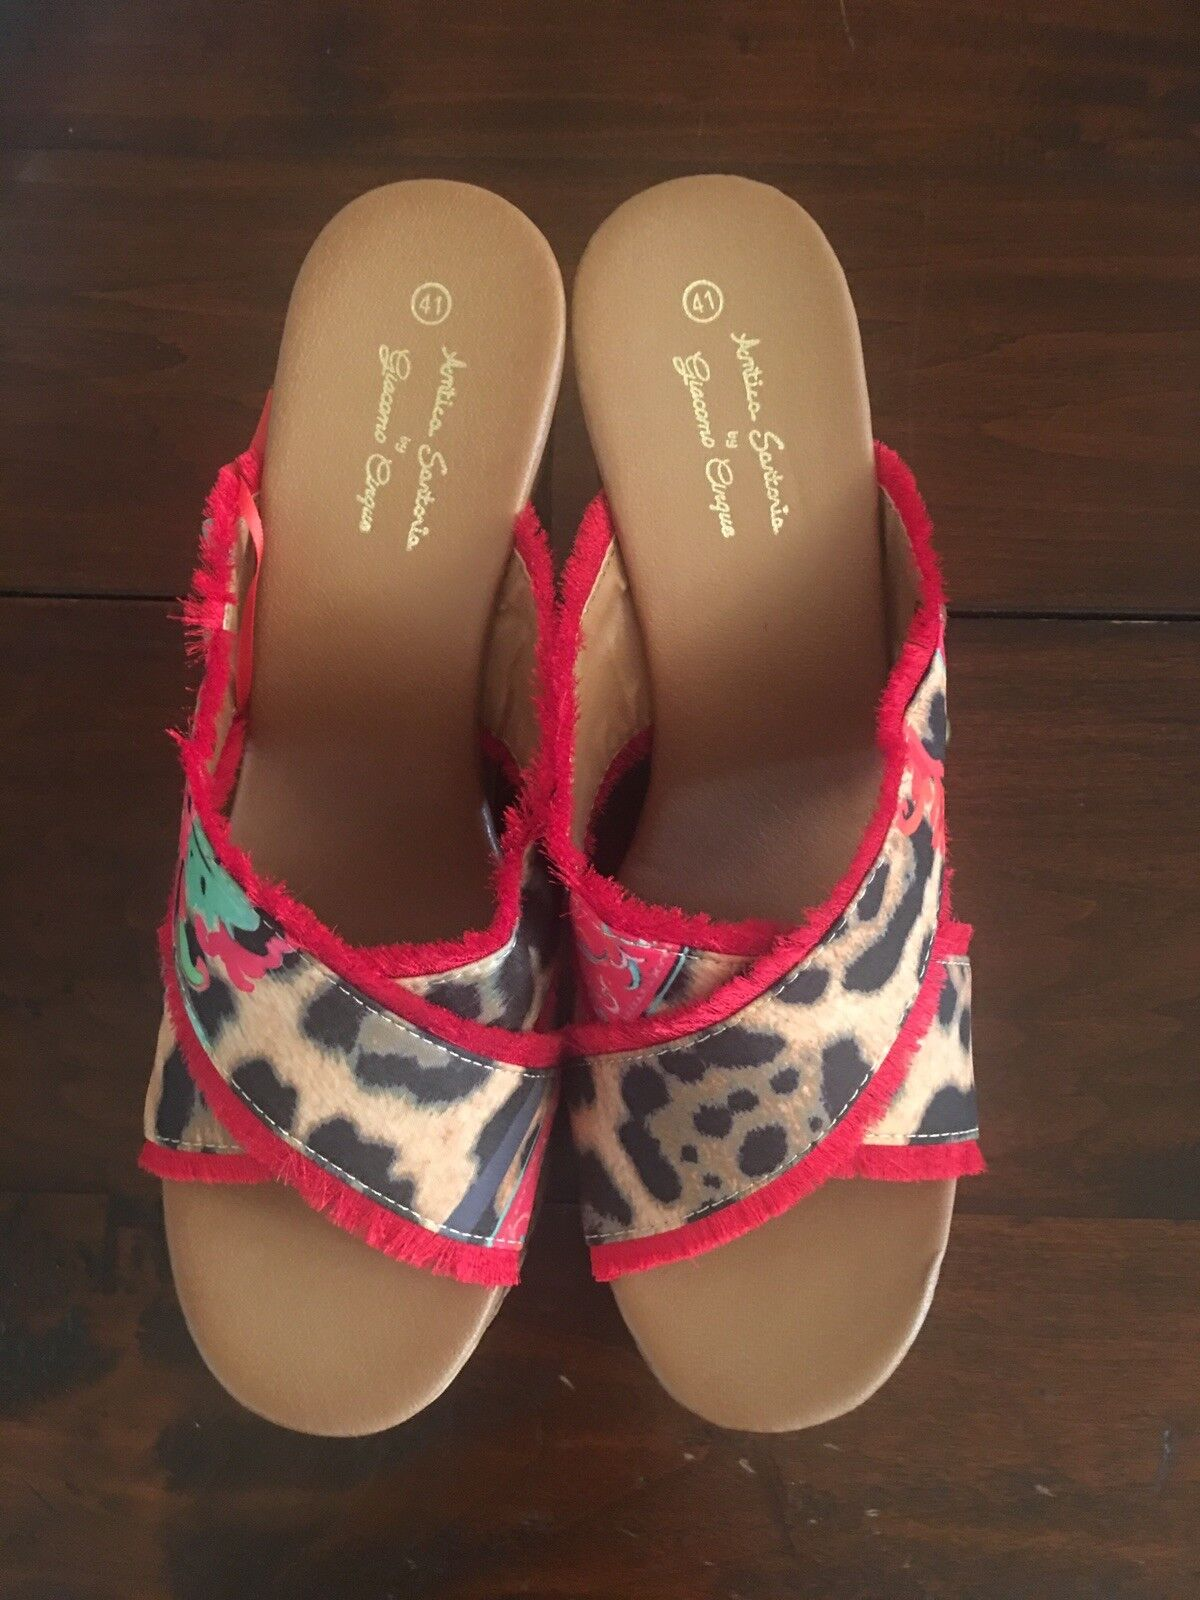 Antica Sartoria Wedge Slide Sandals NWT  ️